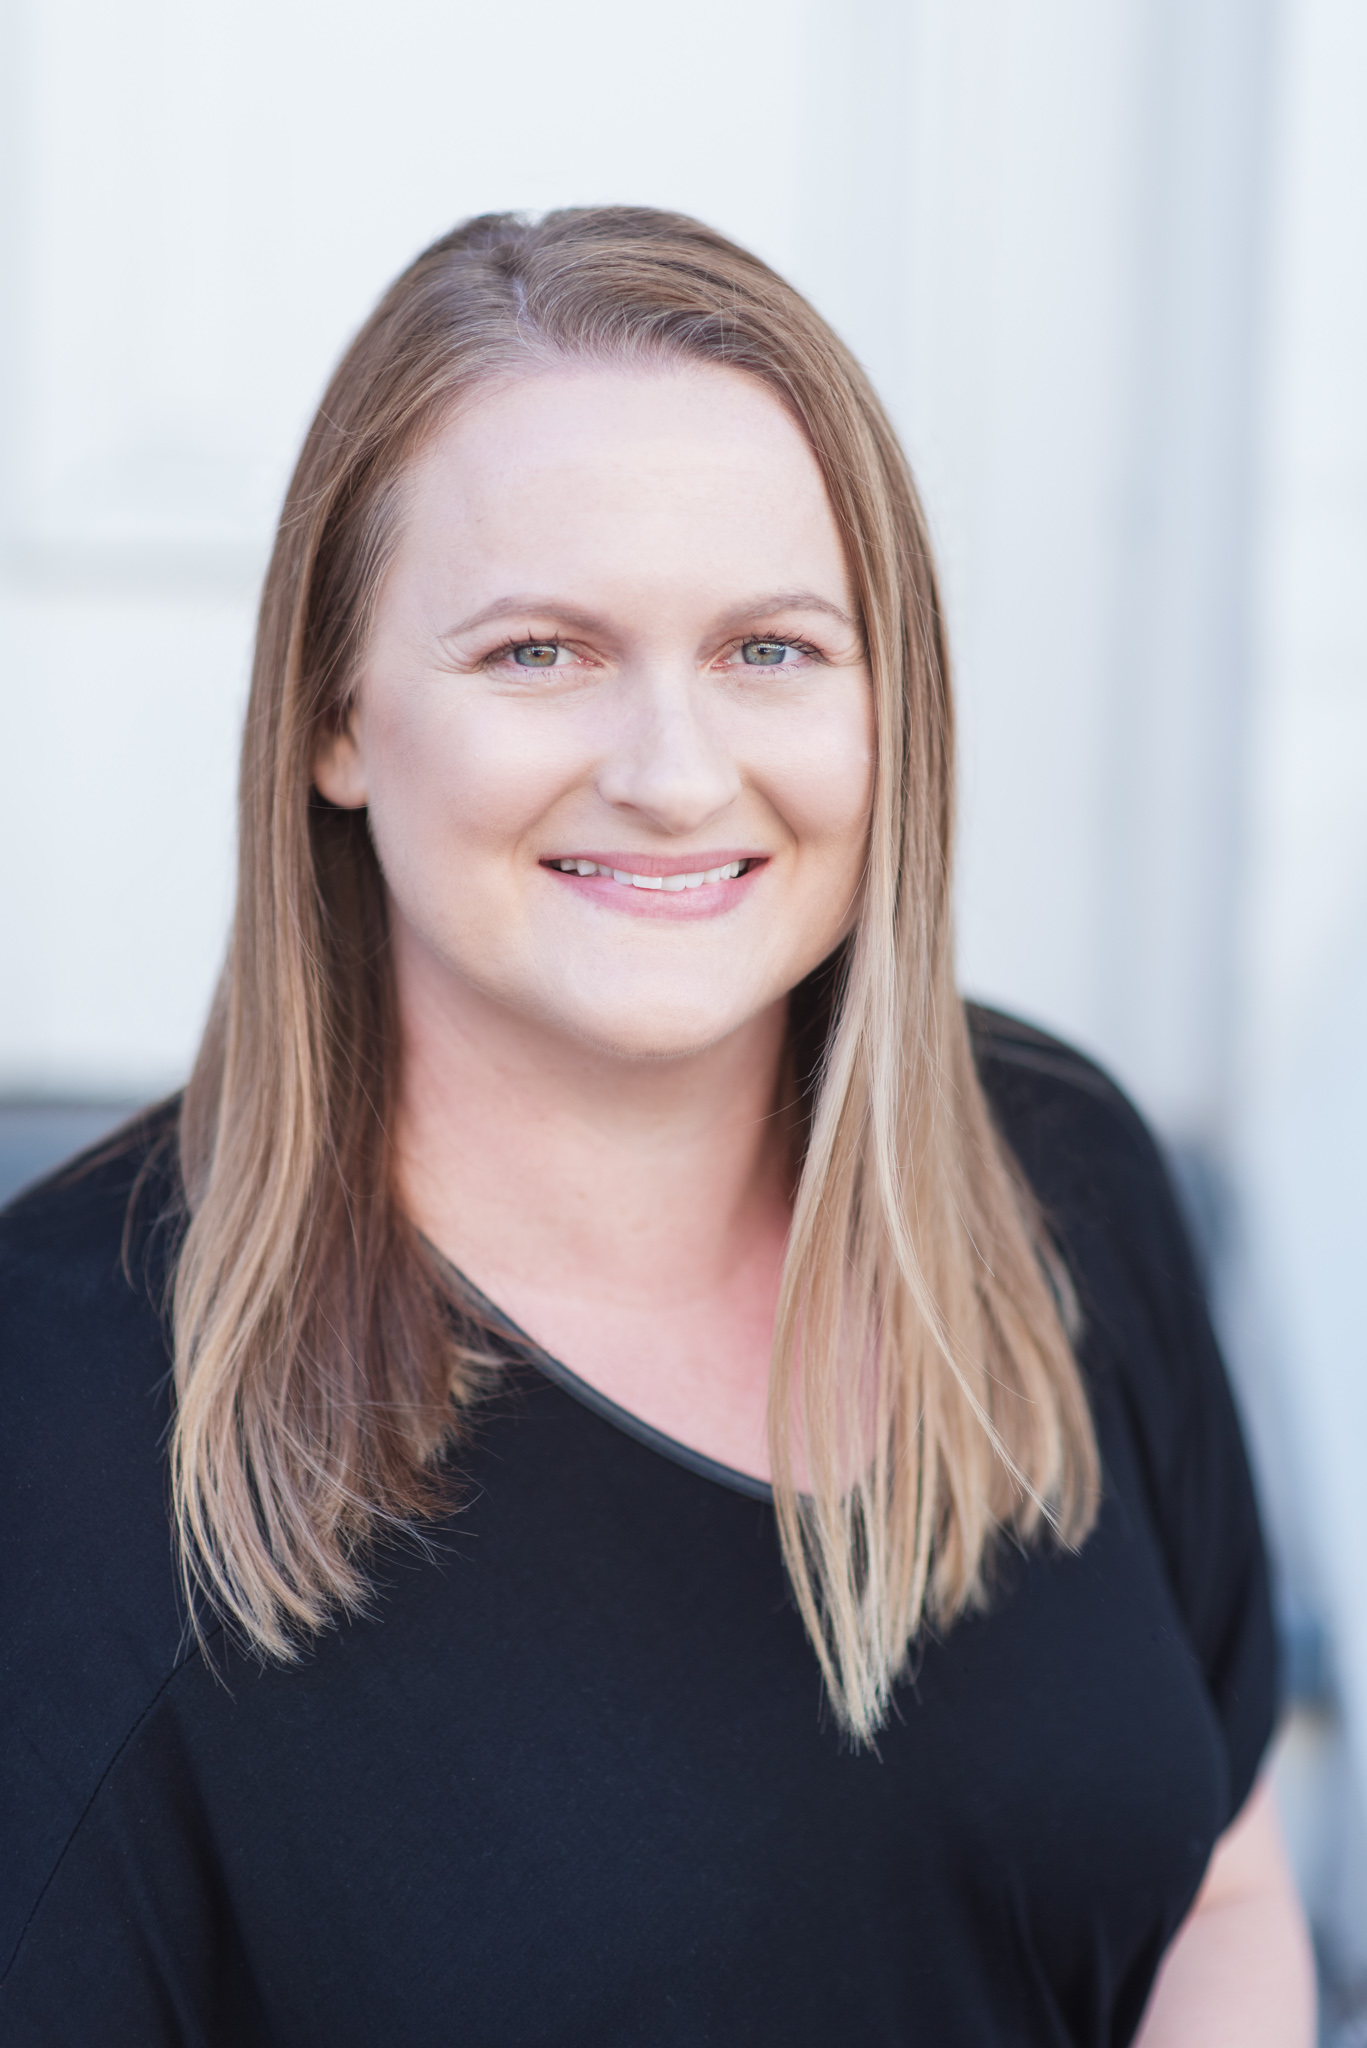 - Leonie Stratton - Founder of Boutique Finance Perth